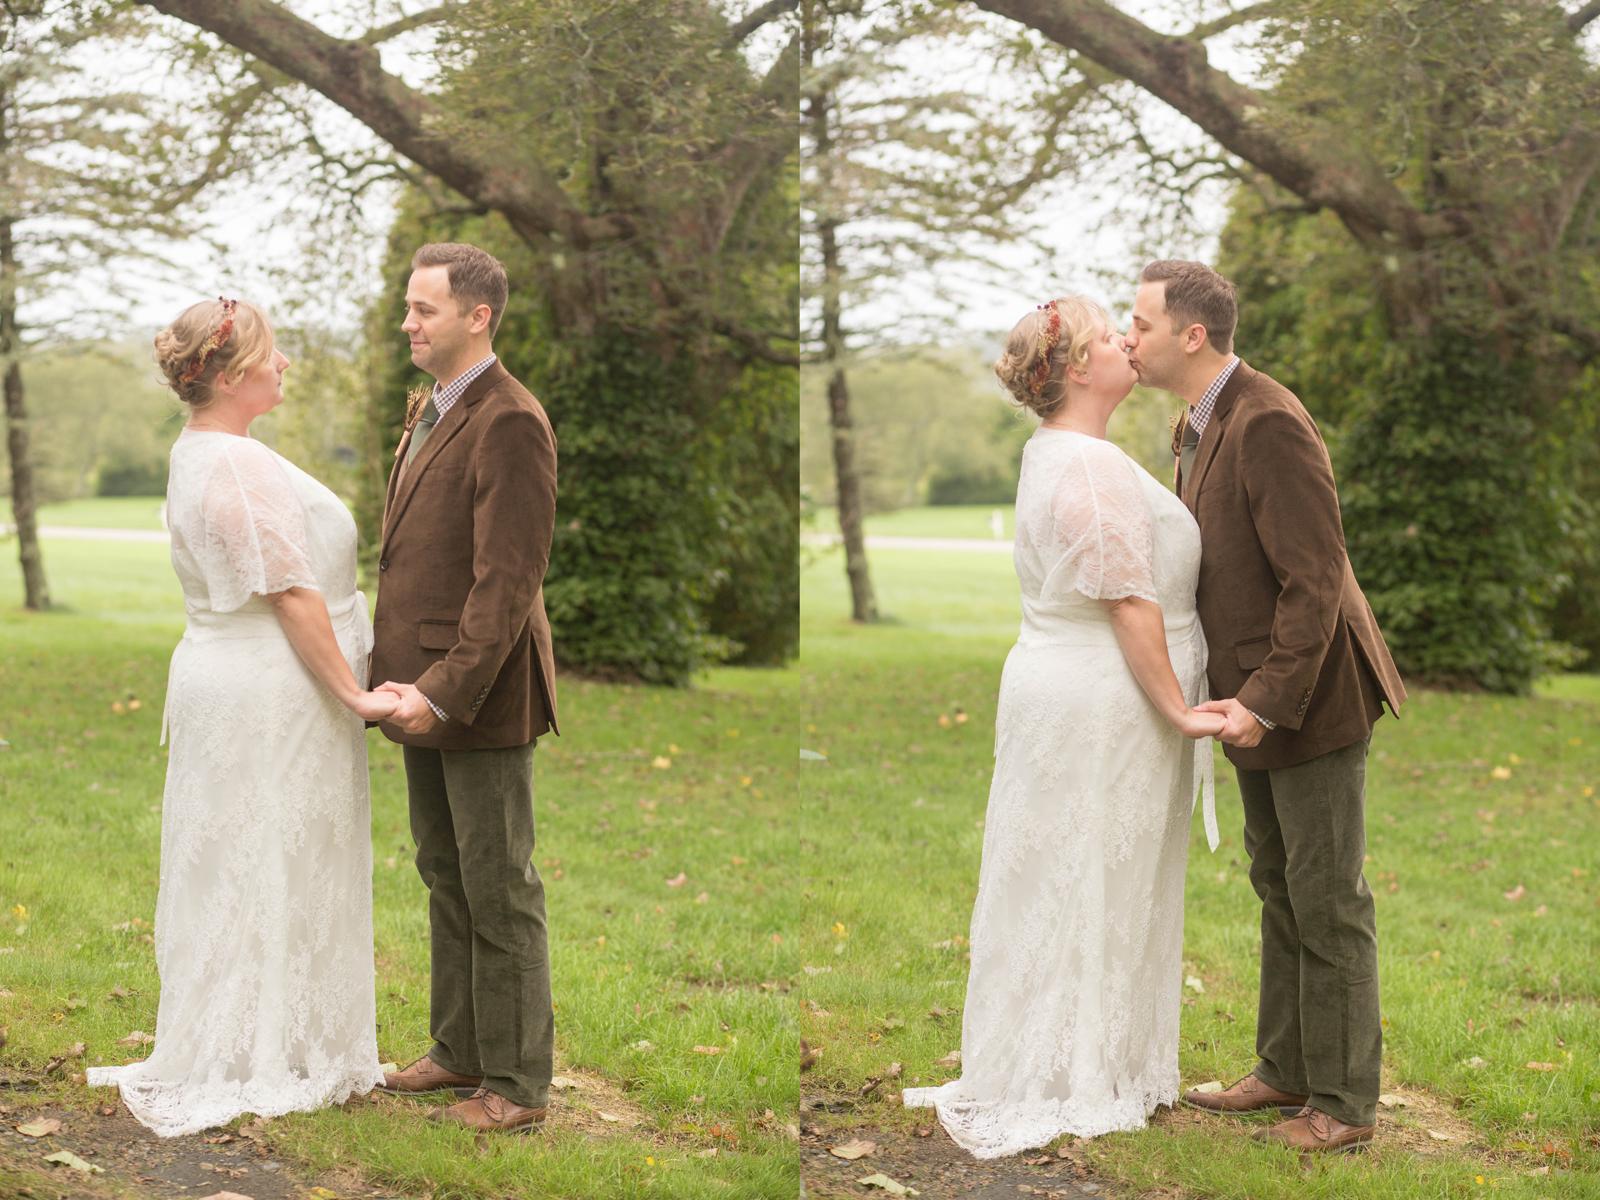 rhode island wedding photographer.jpg